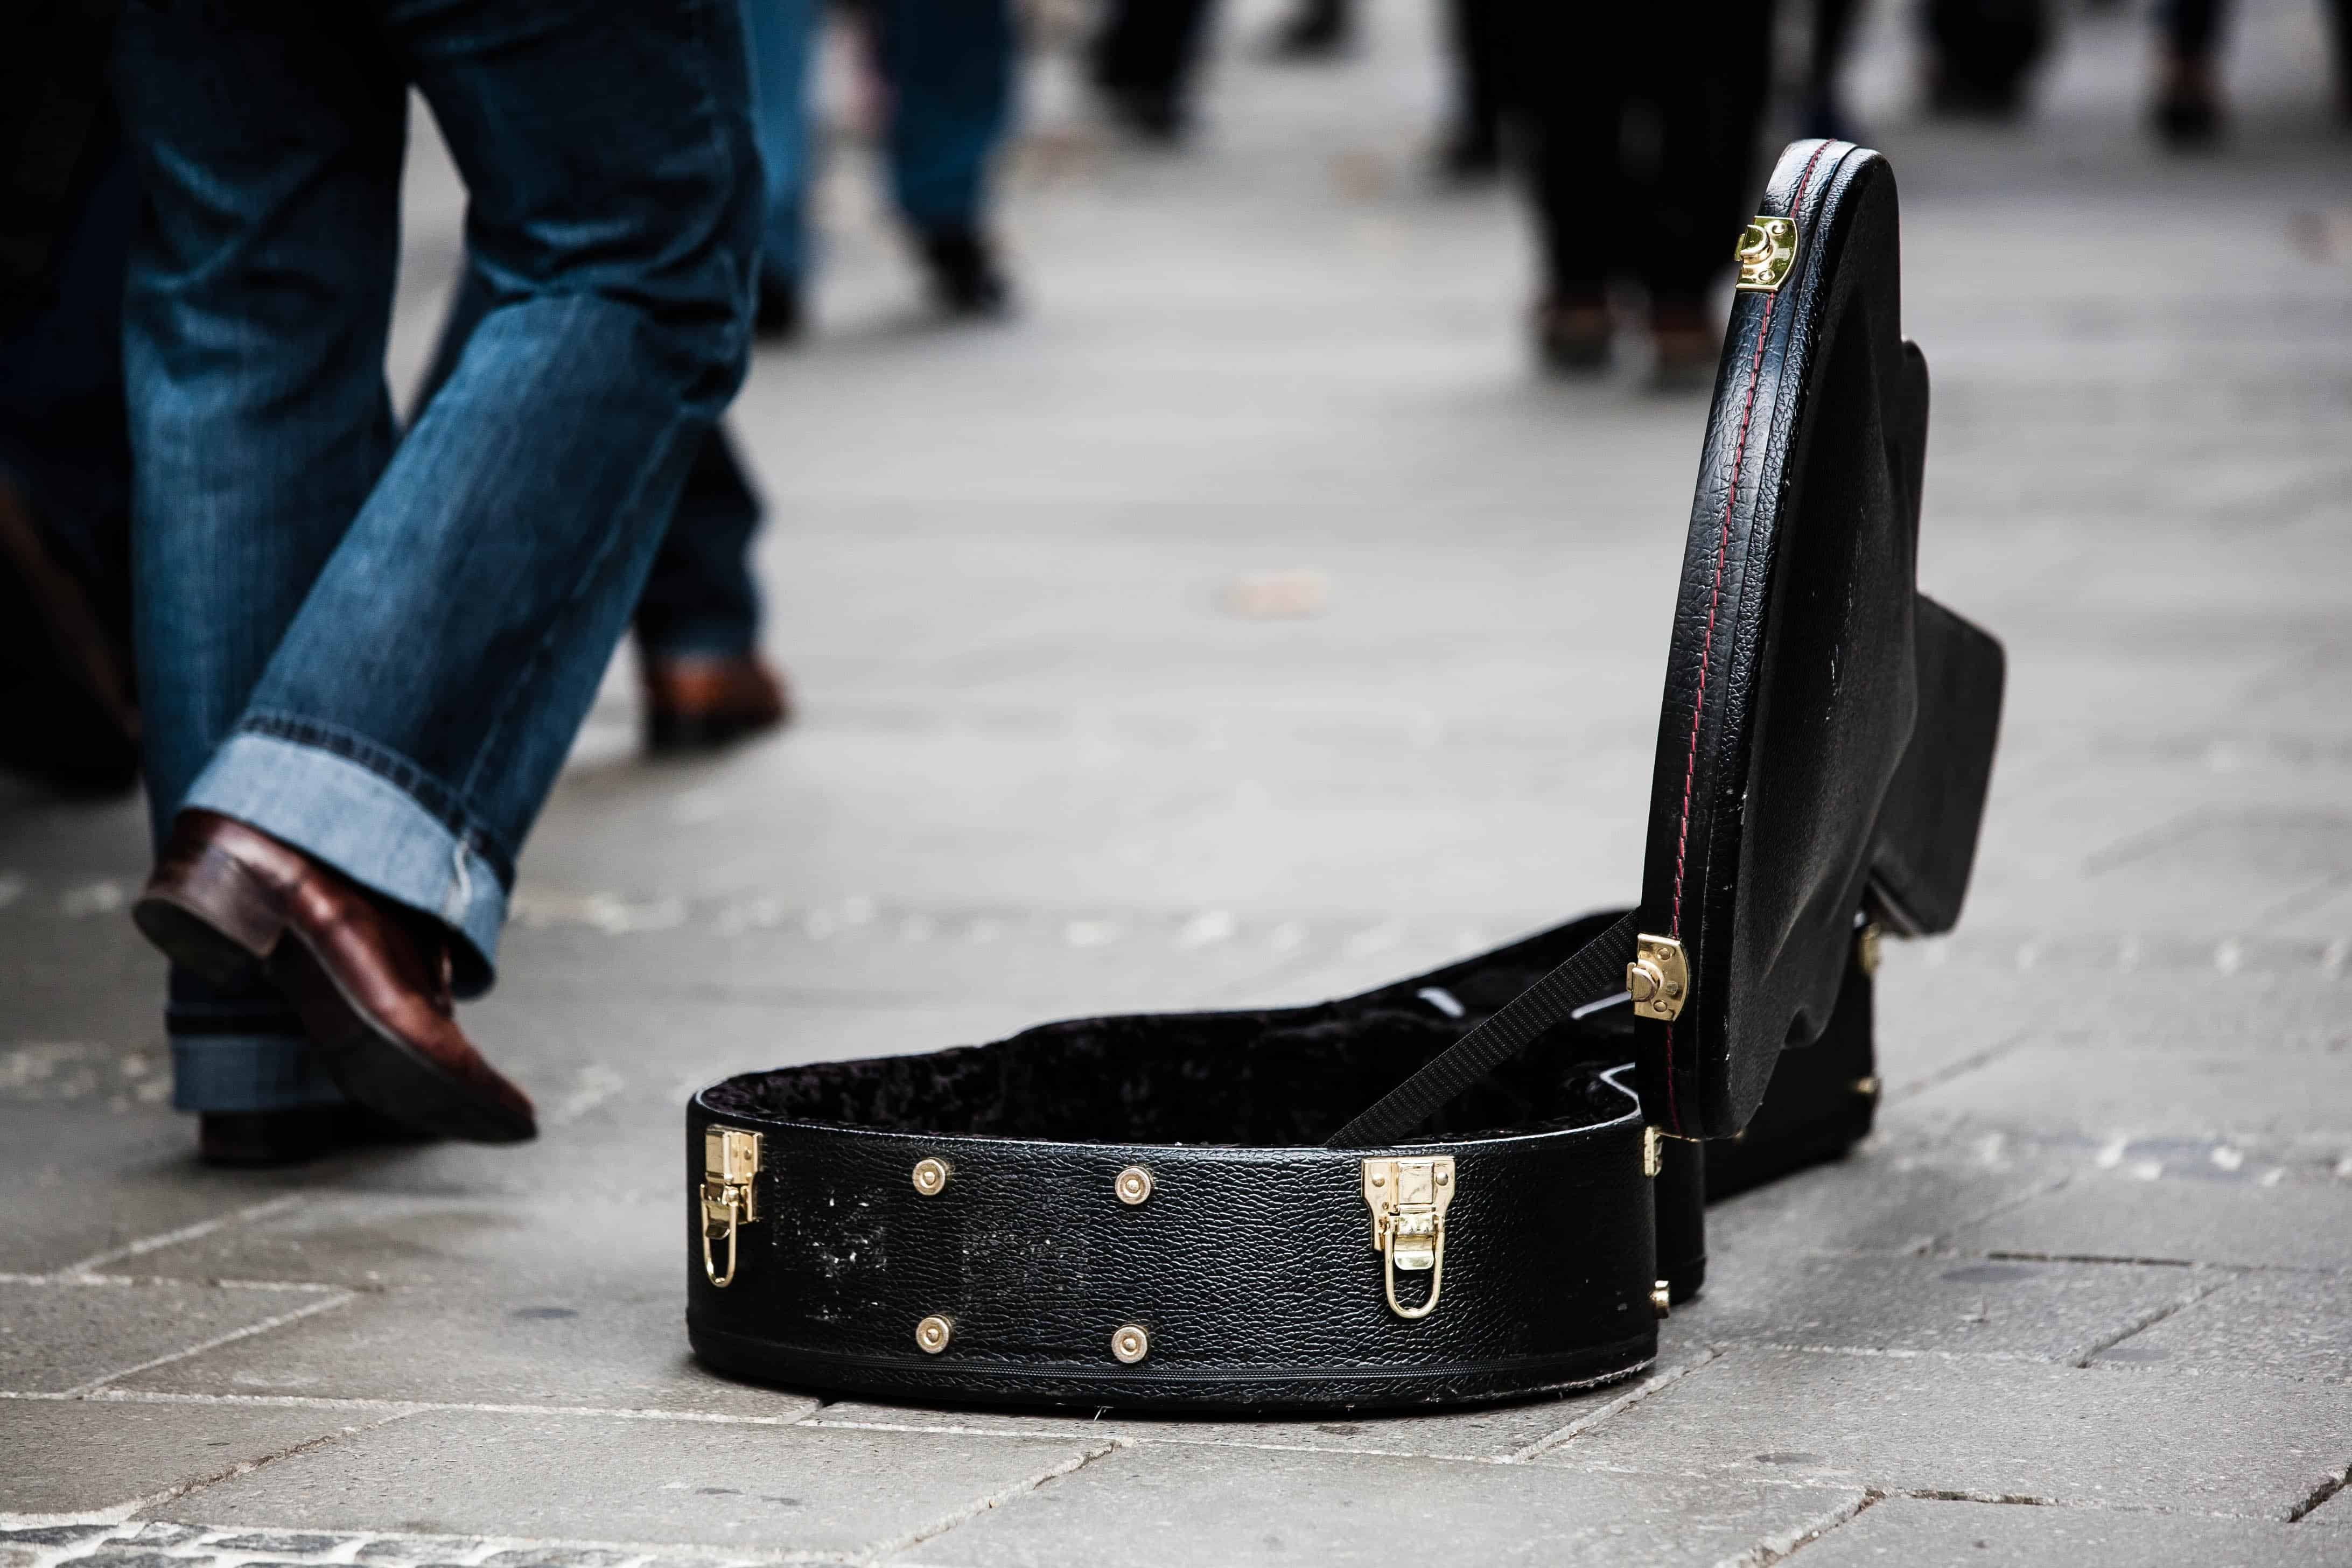 adakozni utcazenésznek